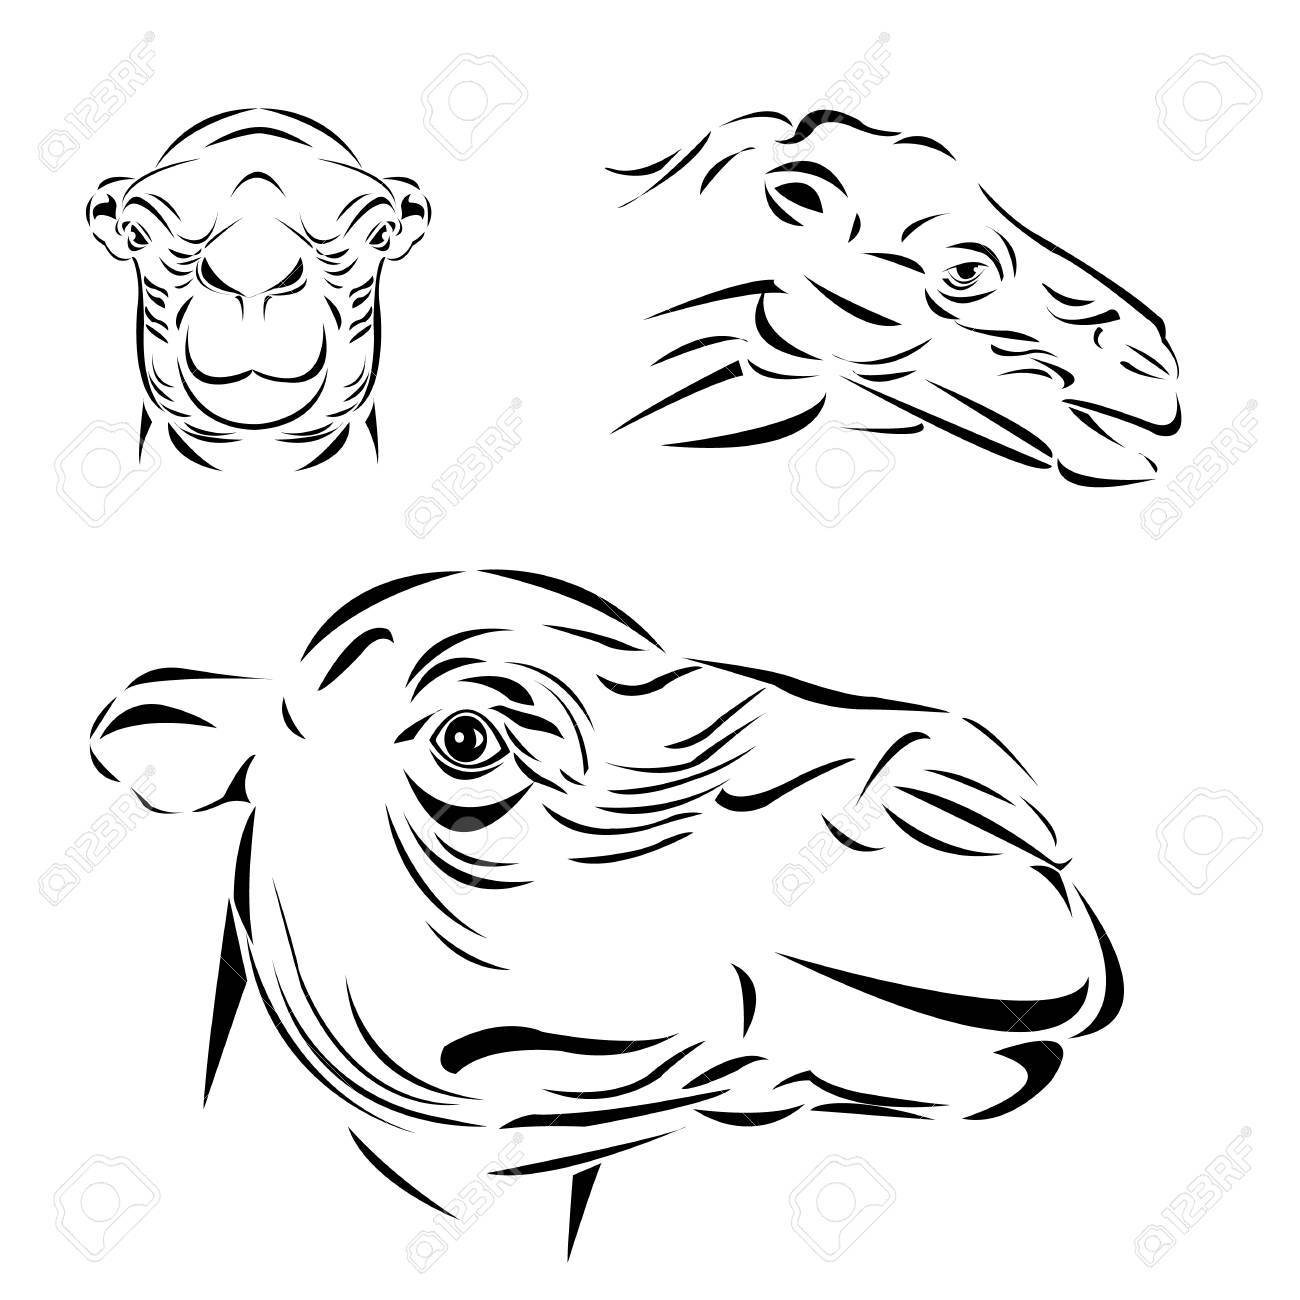 Line art of camel head on white background